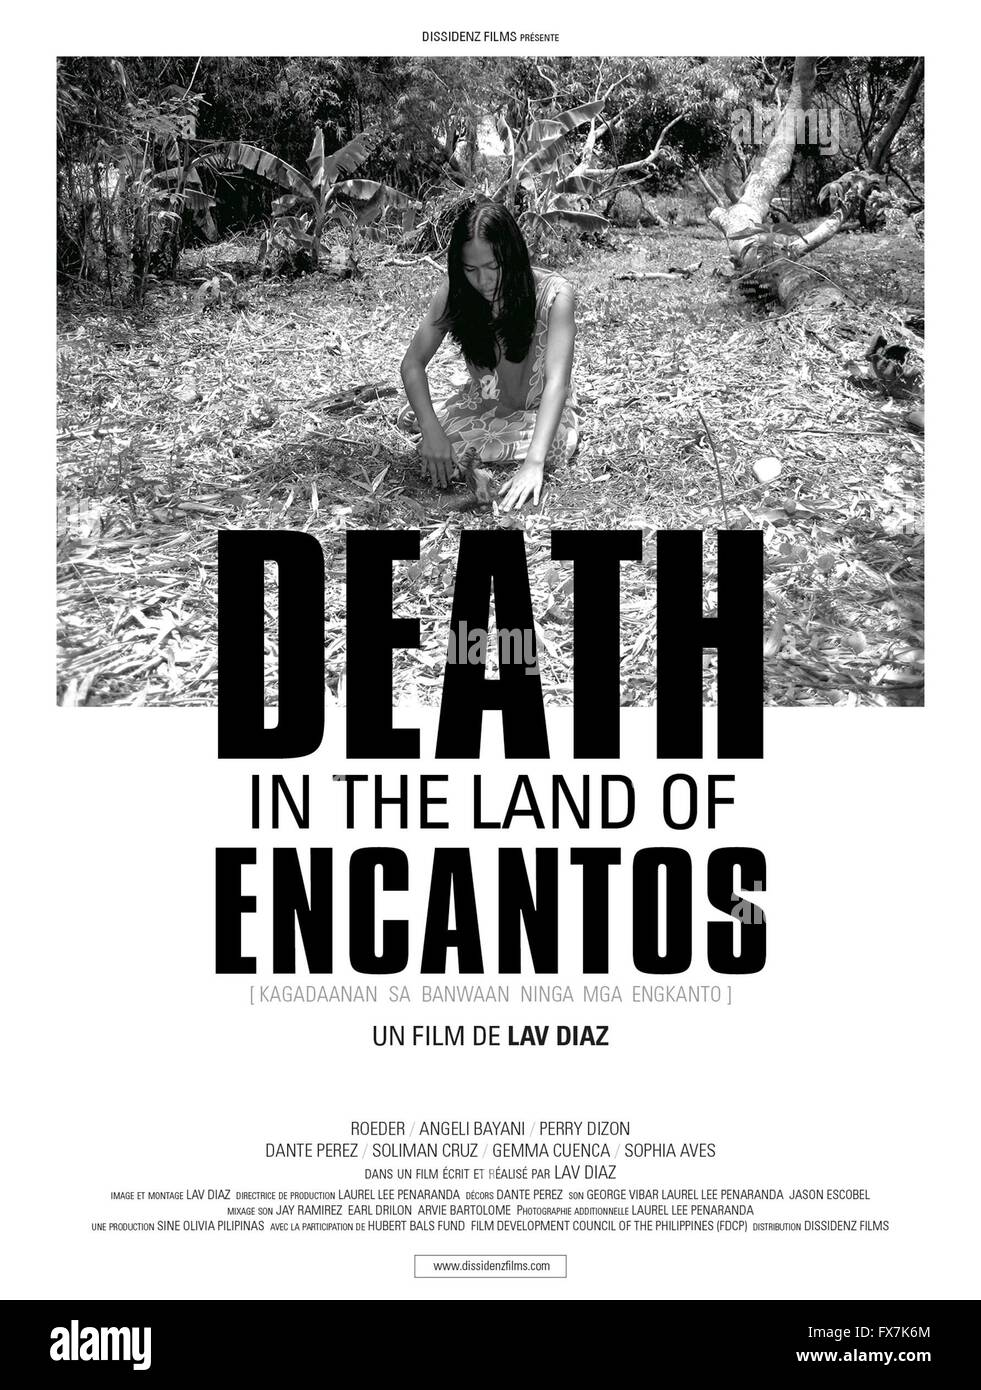 Death in the Land of Encantos Kagadanan sa banwaan ning mga engkanto Year : 2007 Philippines Director : Lav Diaz - Stock Image